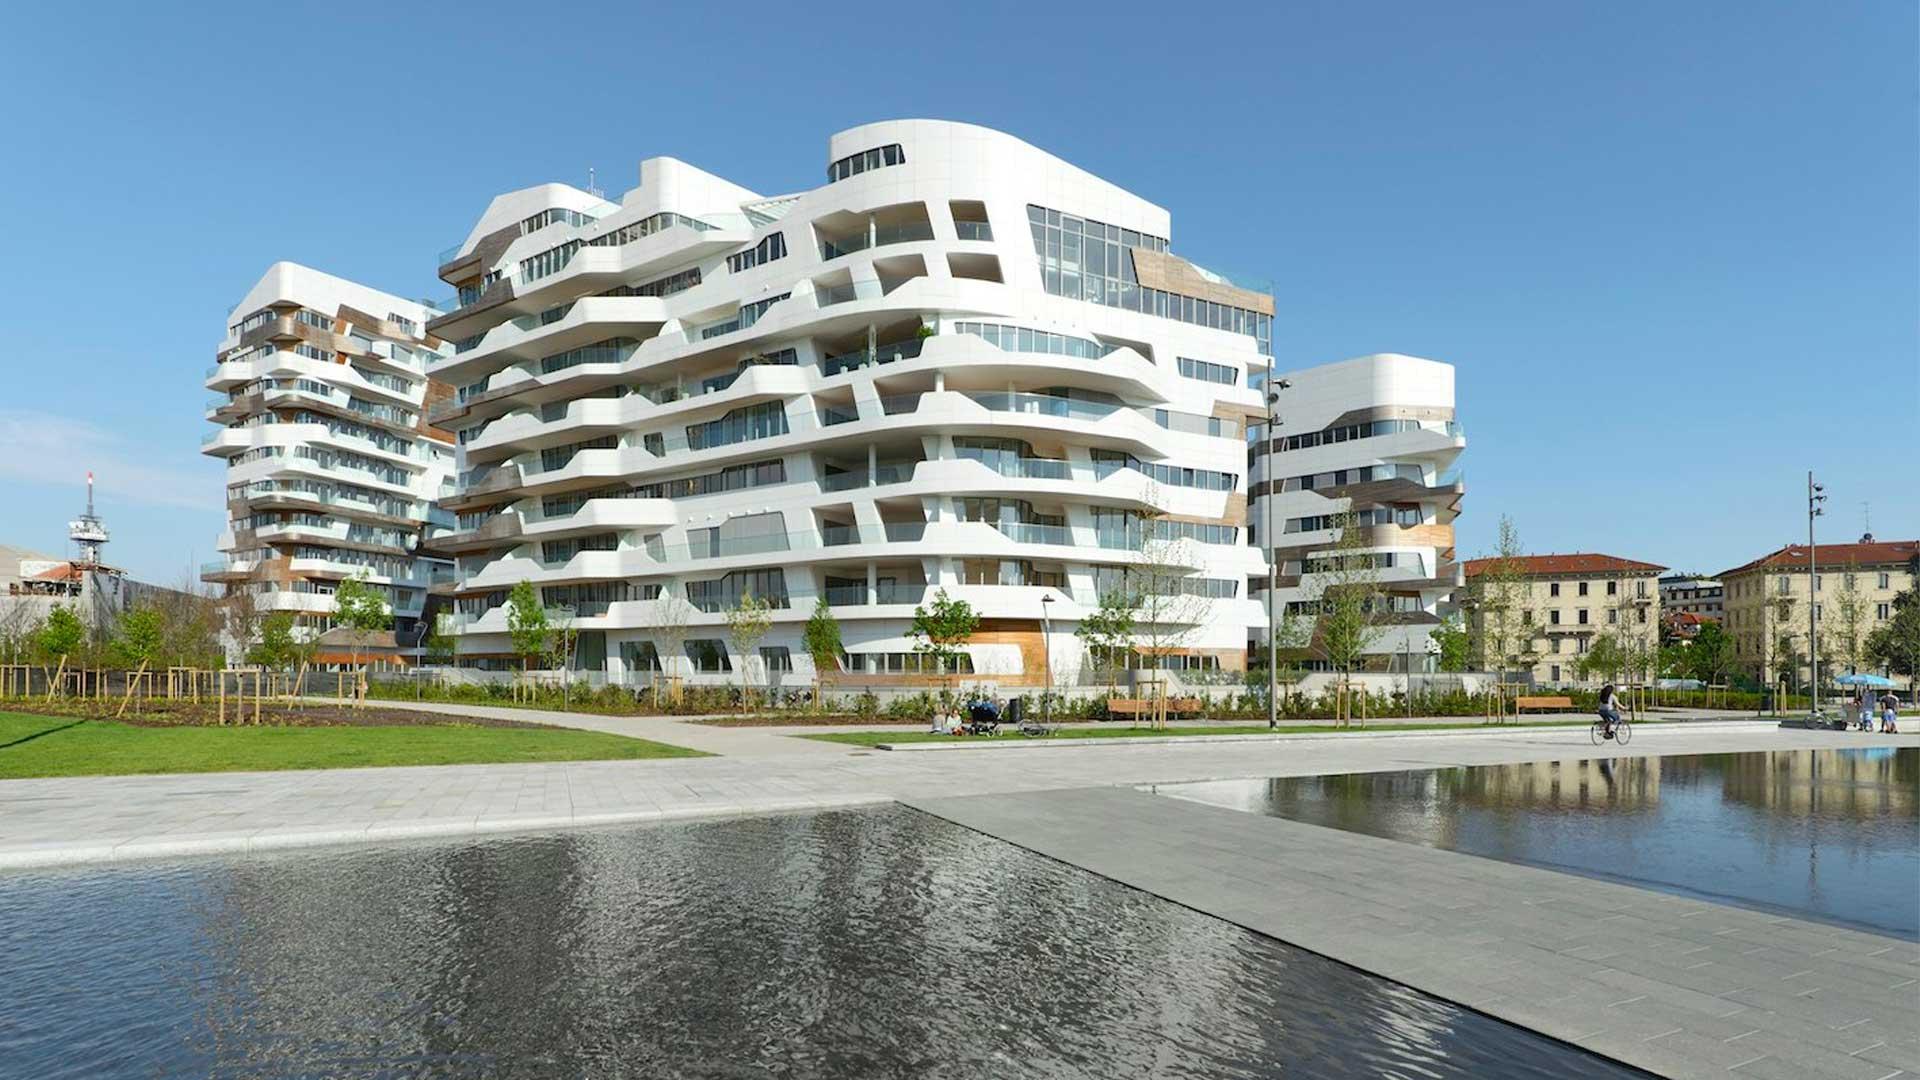 Penthouse One-11 CityLife